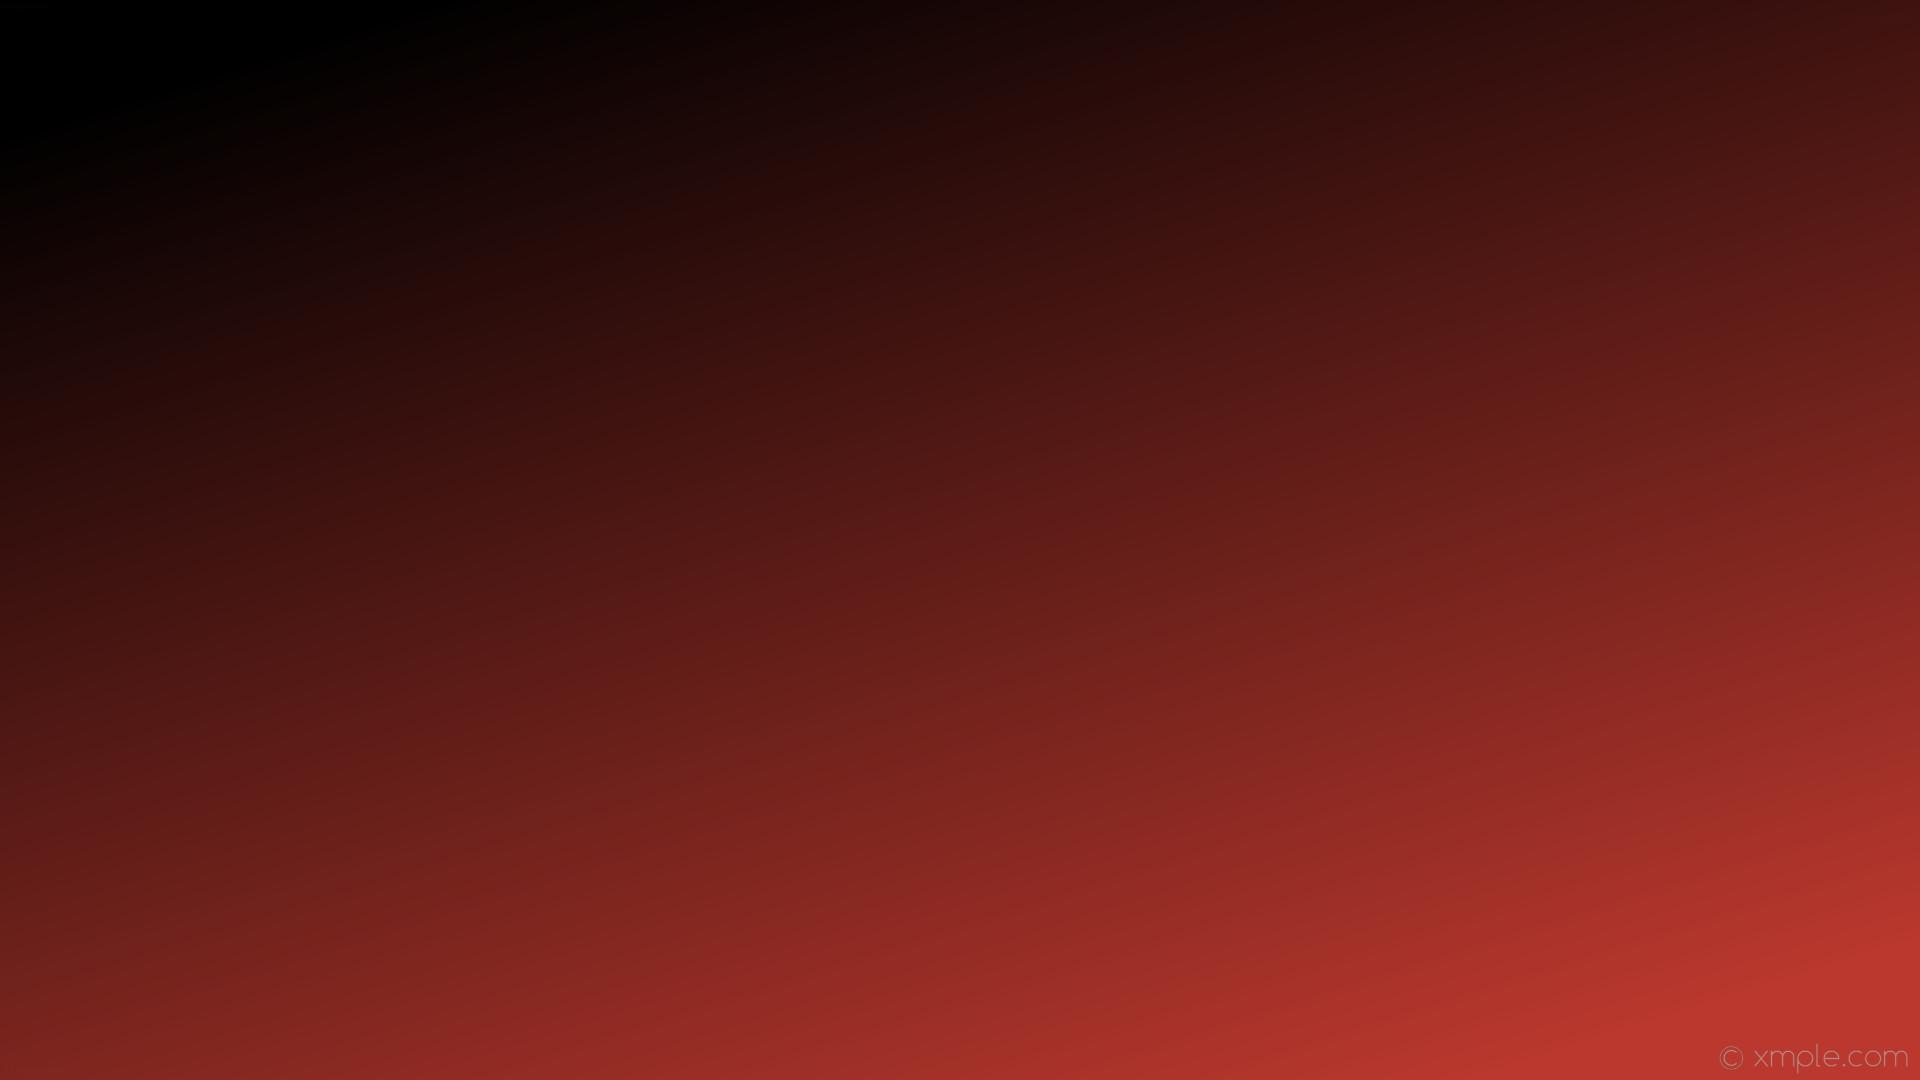 wallpaper linear red black gradient #bb382e #000000 315°